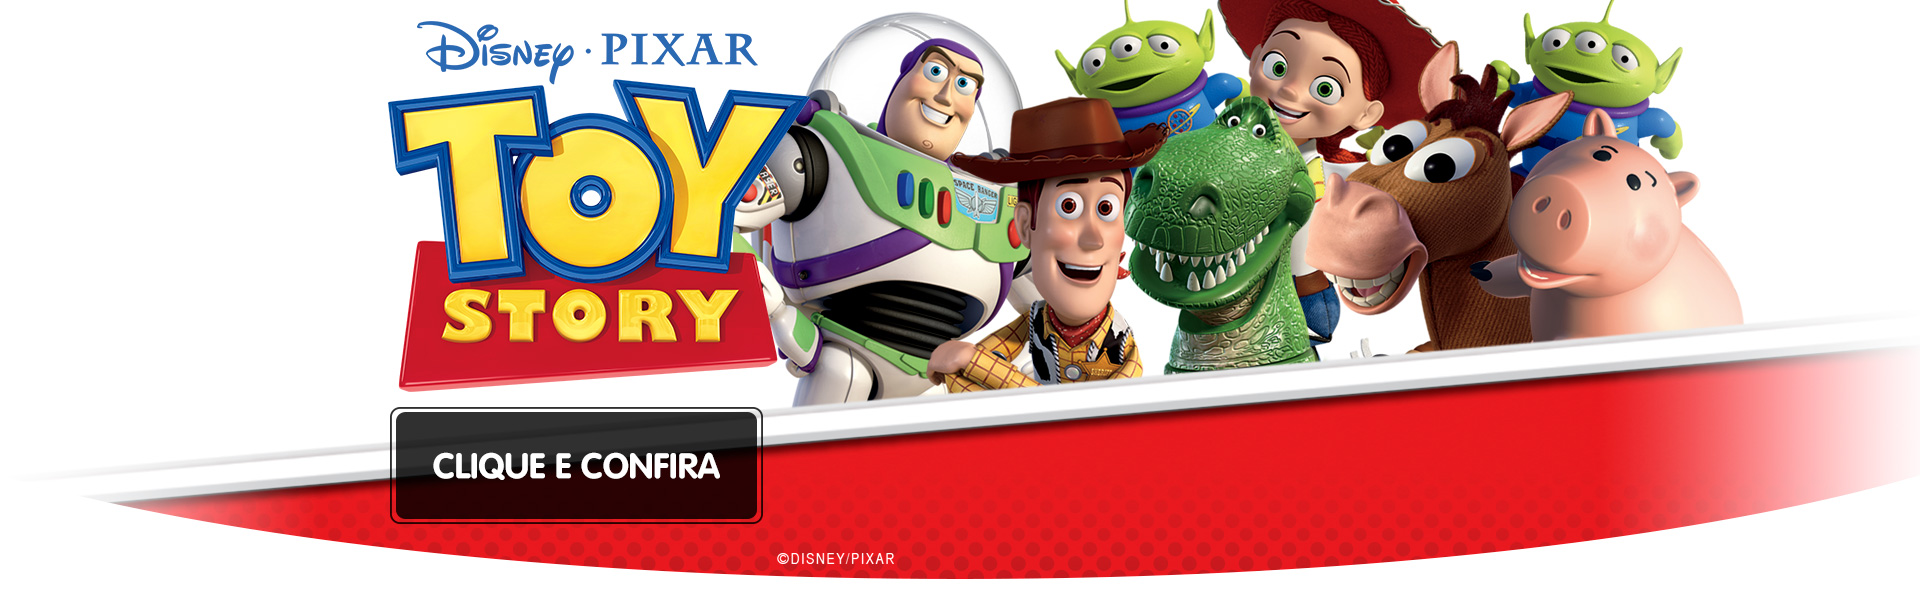 Fantasias Toy Story a partir de 249,99